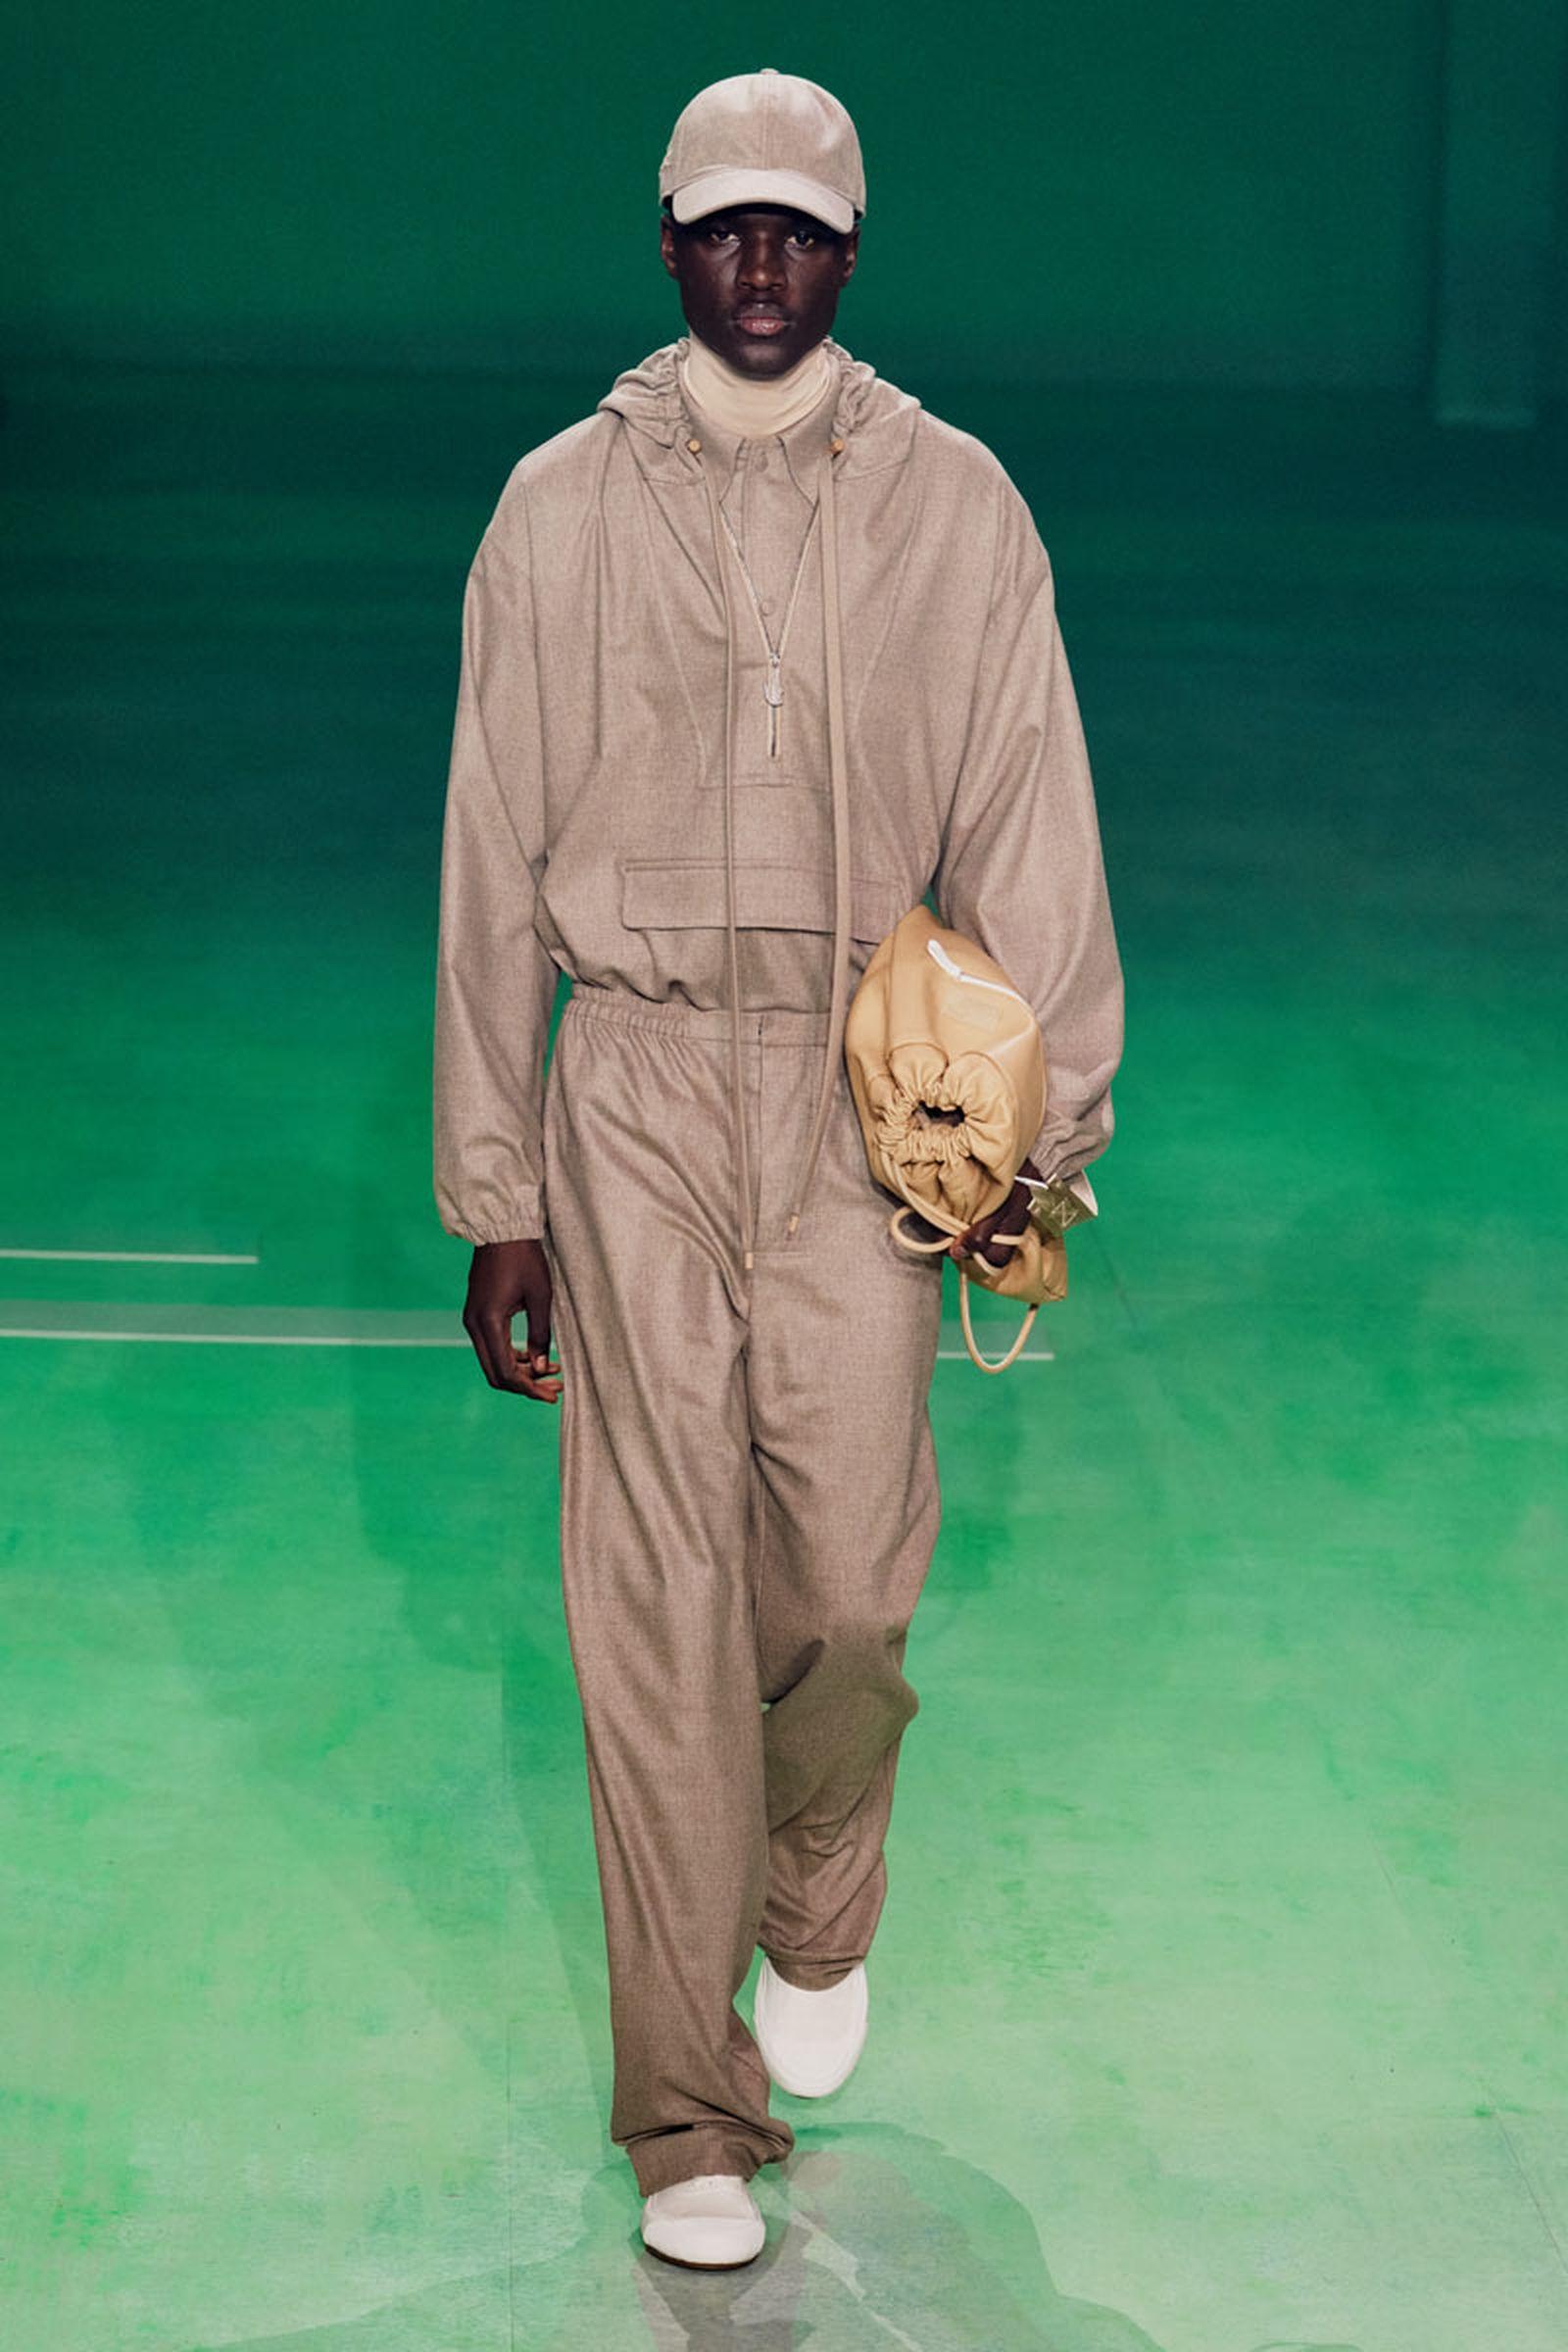 15lascoste fw19 paris fashion week Louise Trotter lacoste runway